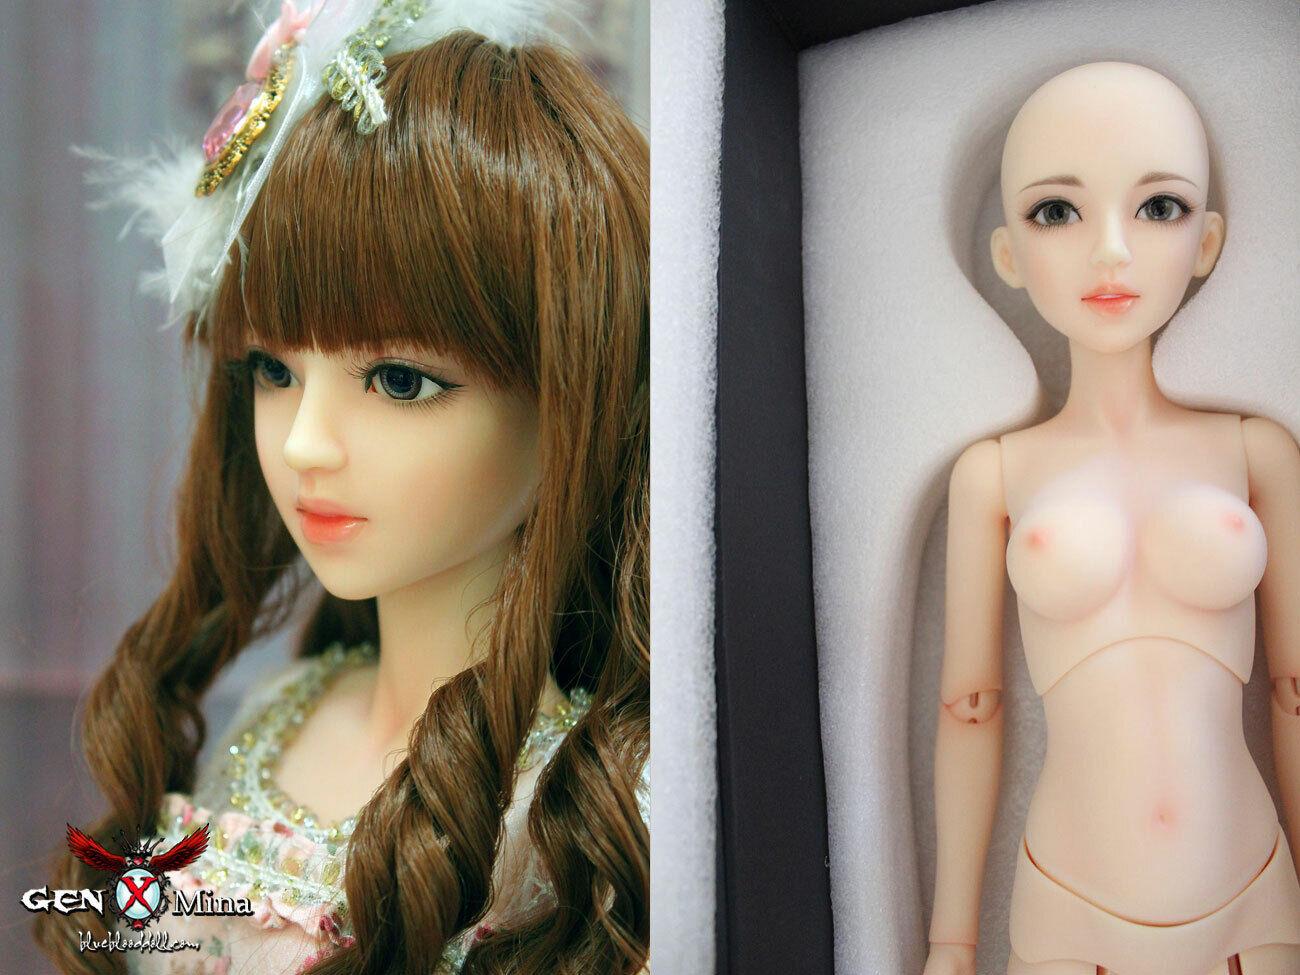 Original 1 3 bjd girl bare doll GEN X Mina FREE face up & body Blaushing shipUS